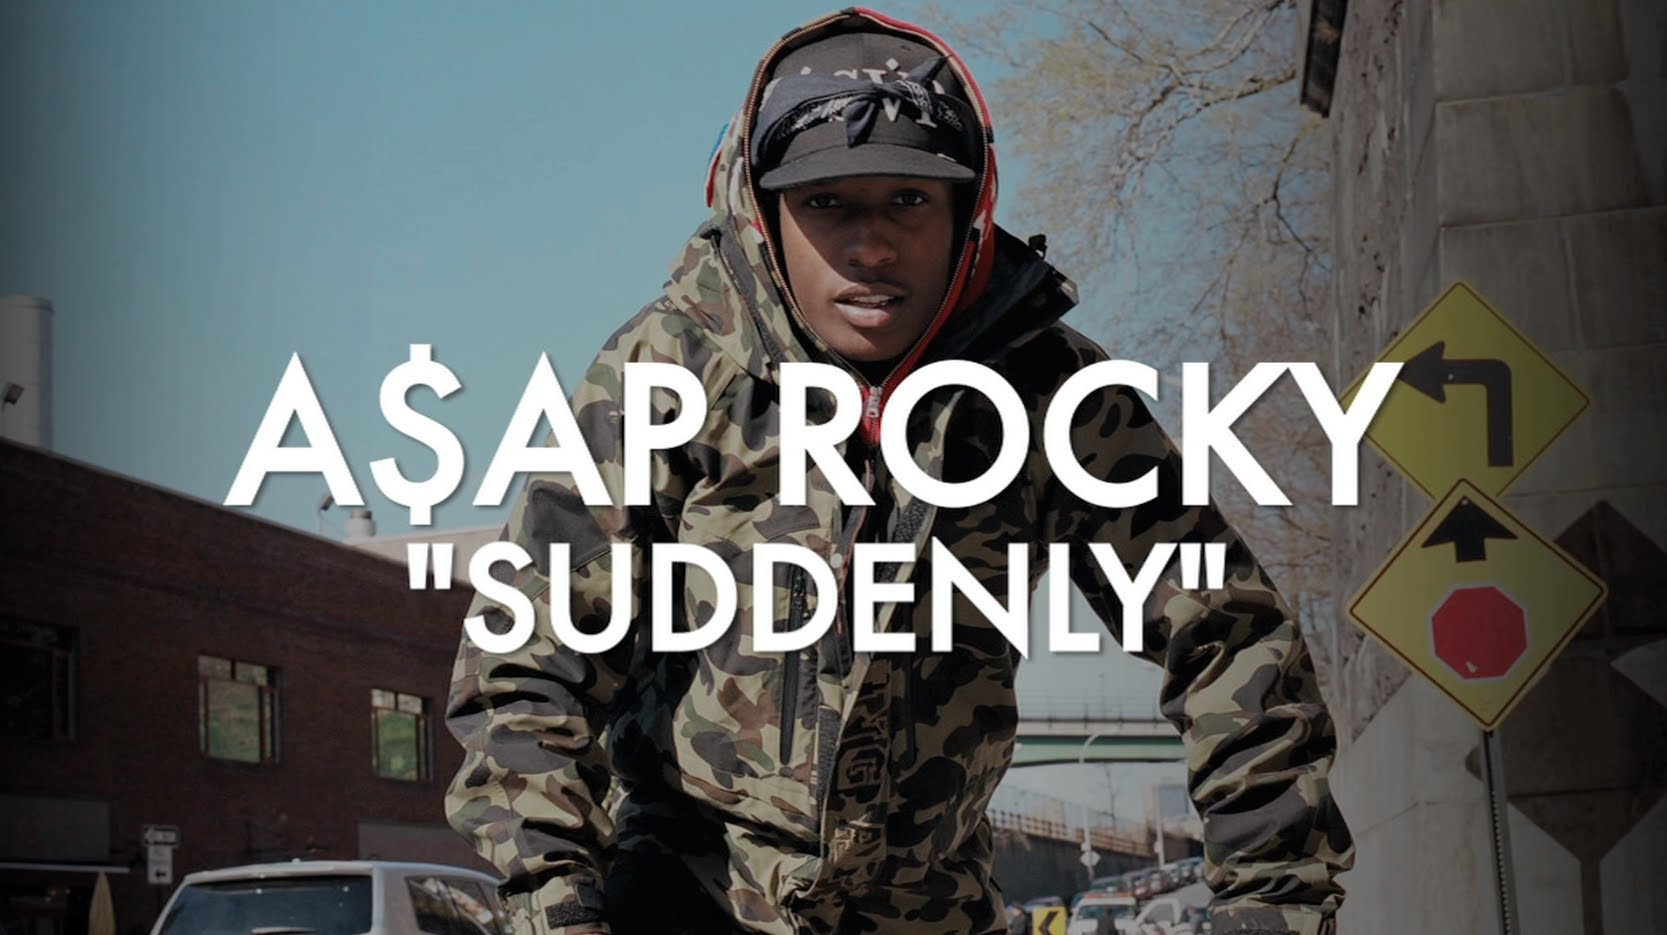 A$AP Rocky's Documentary SVDDENLY - Trailer